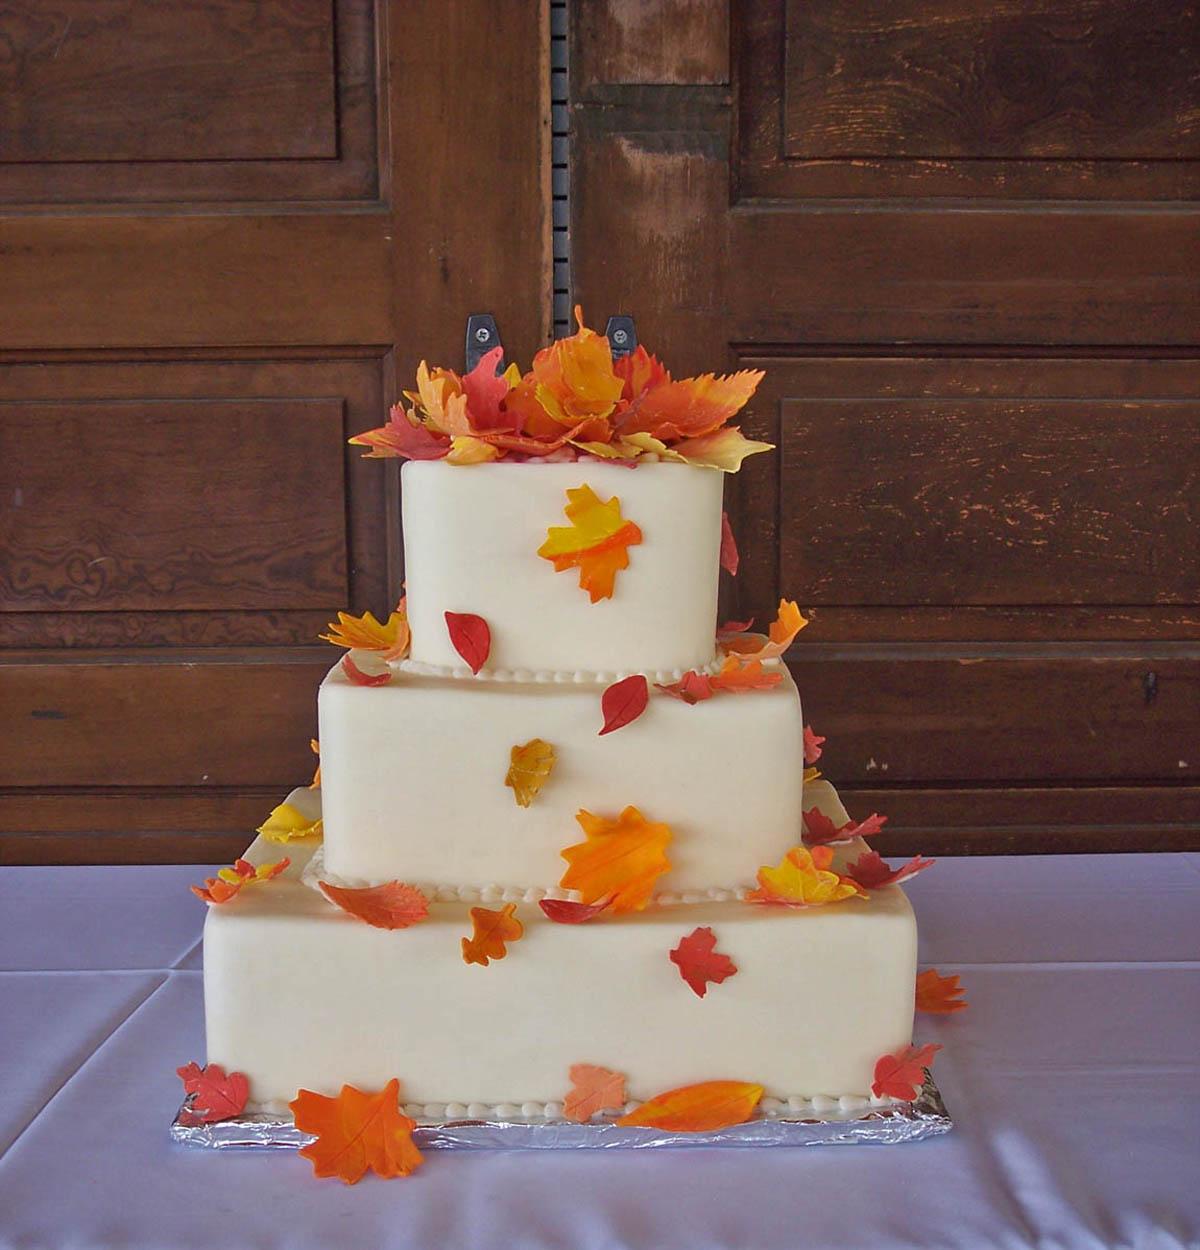 Weddings Autumn Leaf Cake Ideas And Designs